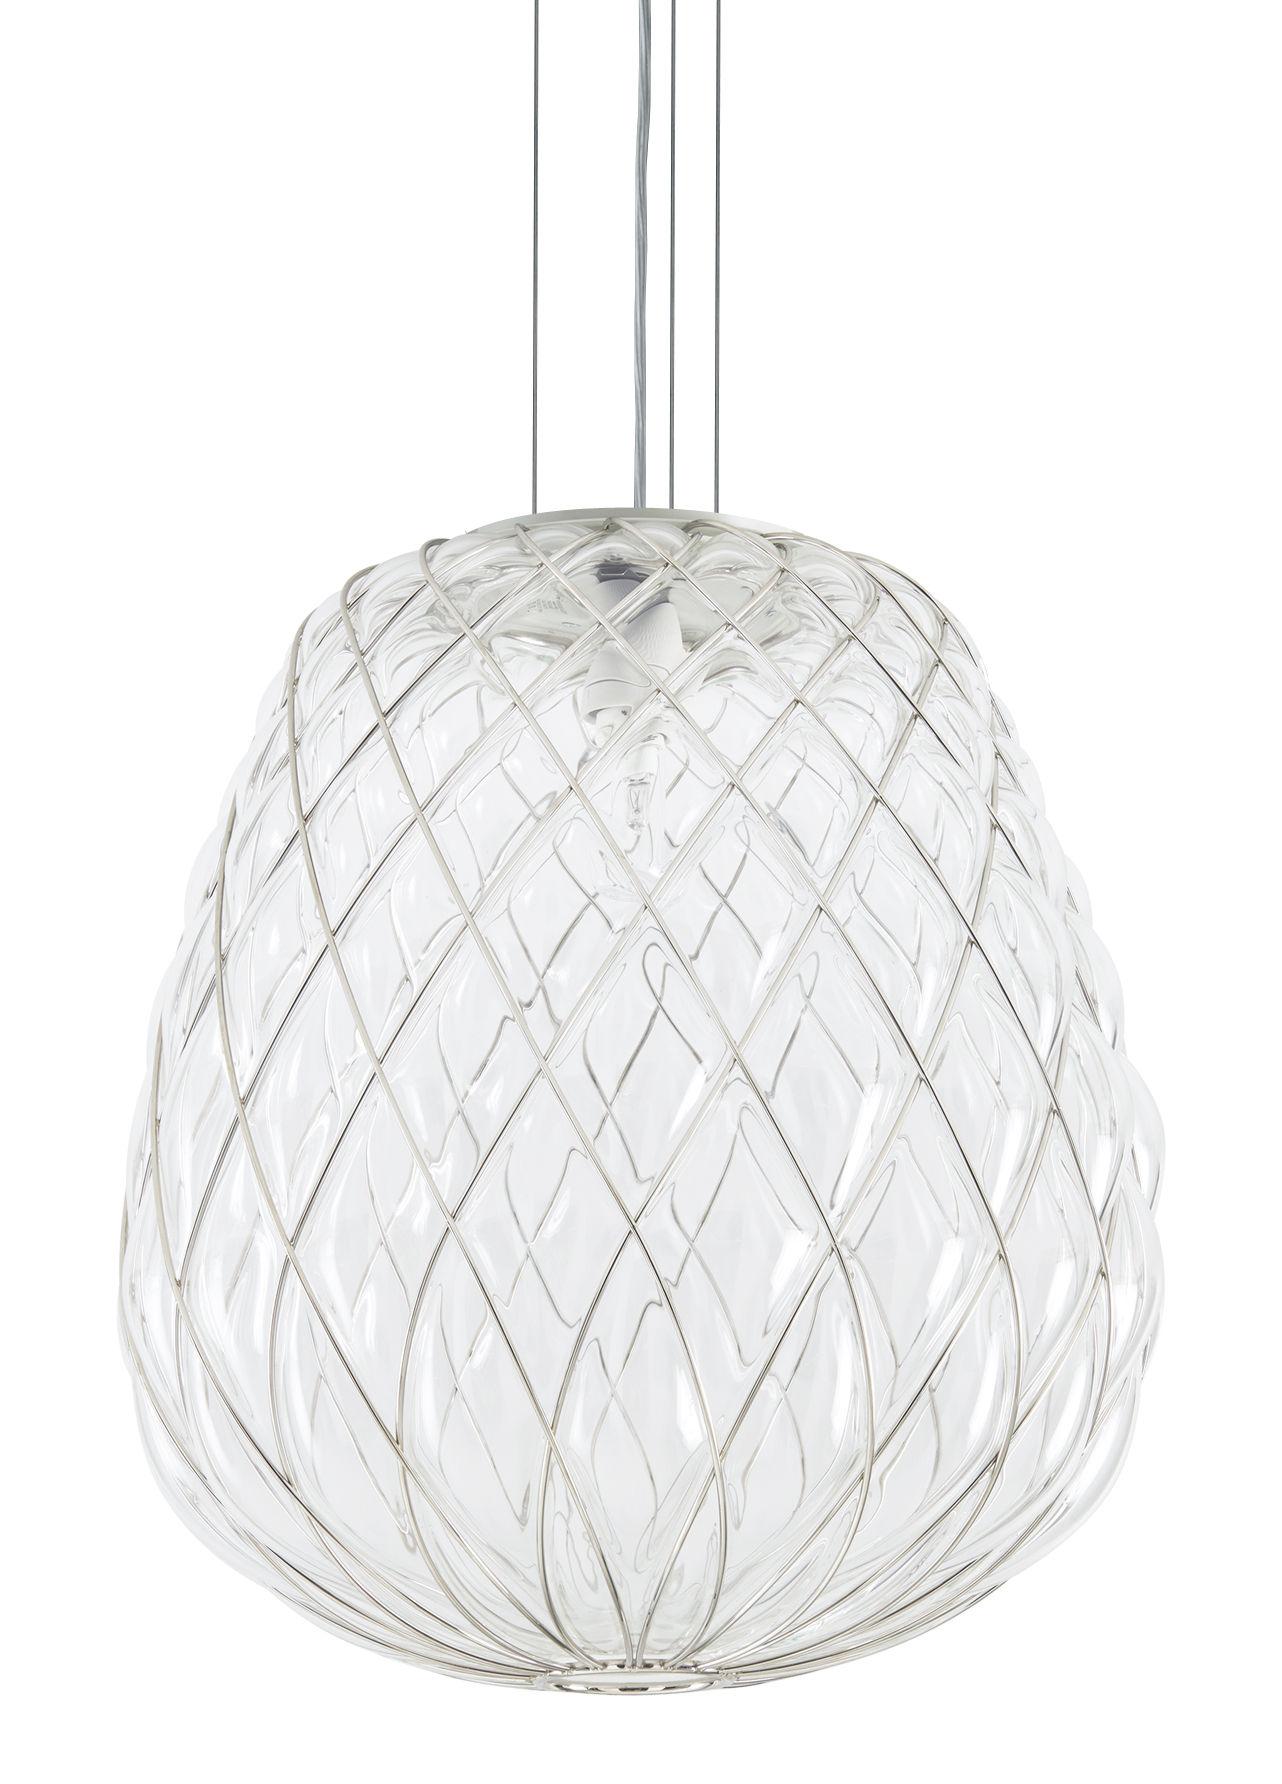 Lighting - Pendant Lighting - Pinecone Pendant - H 52 cm - Glass & metal mesh by Fontana Arte - Transparent / Metal mesh - Metal, Mouth blown glass